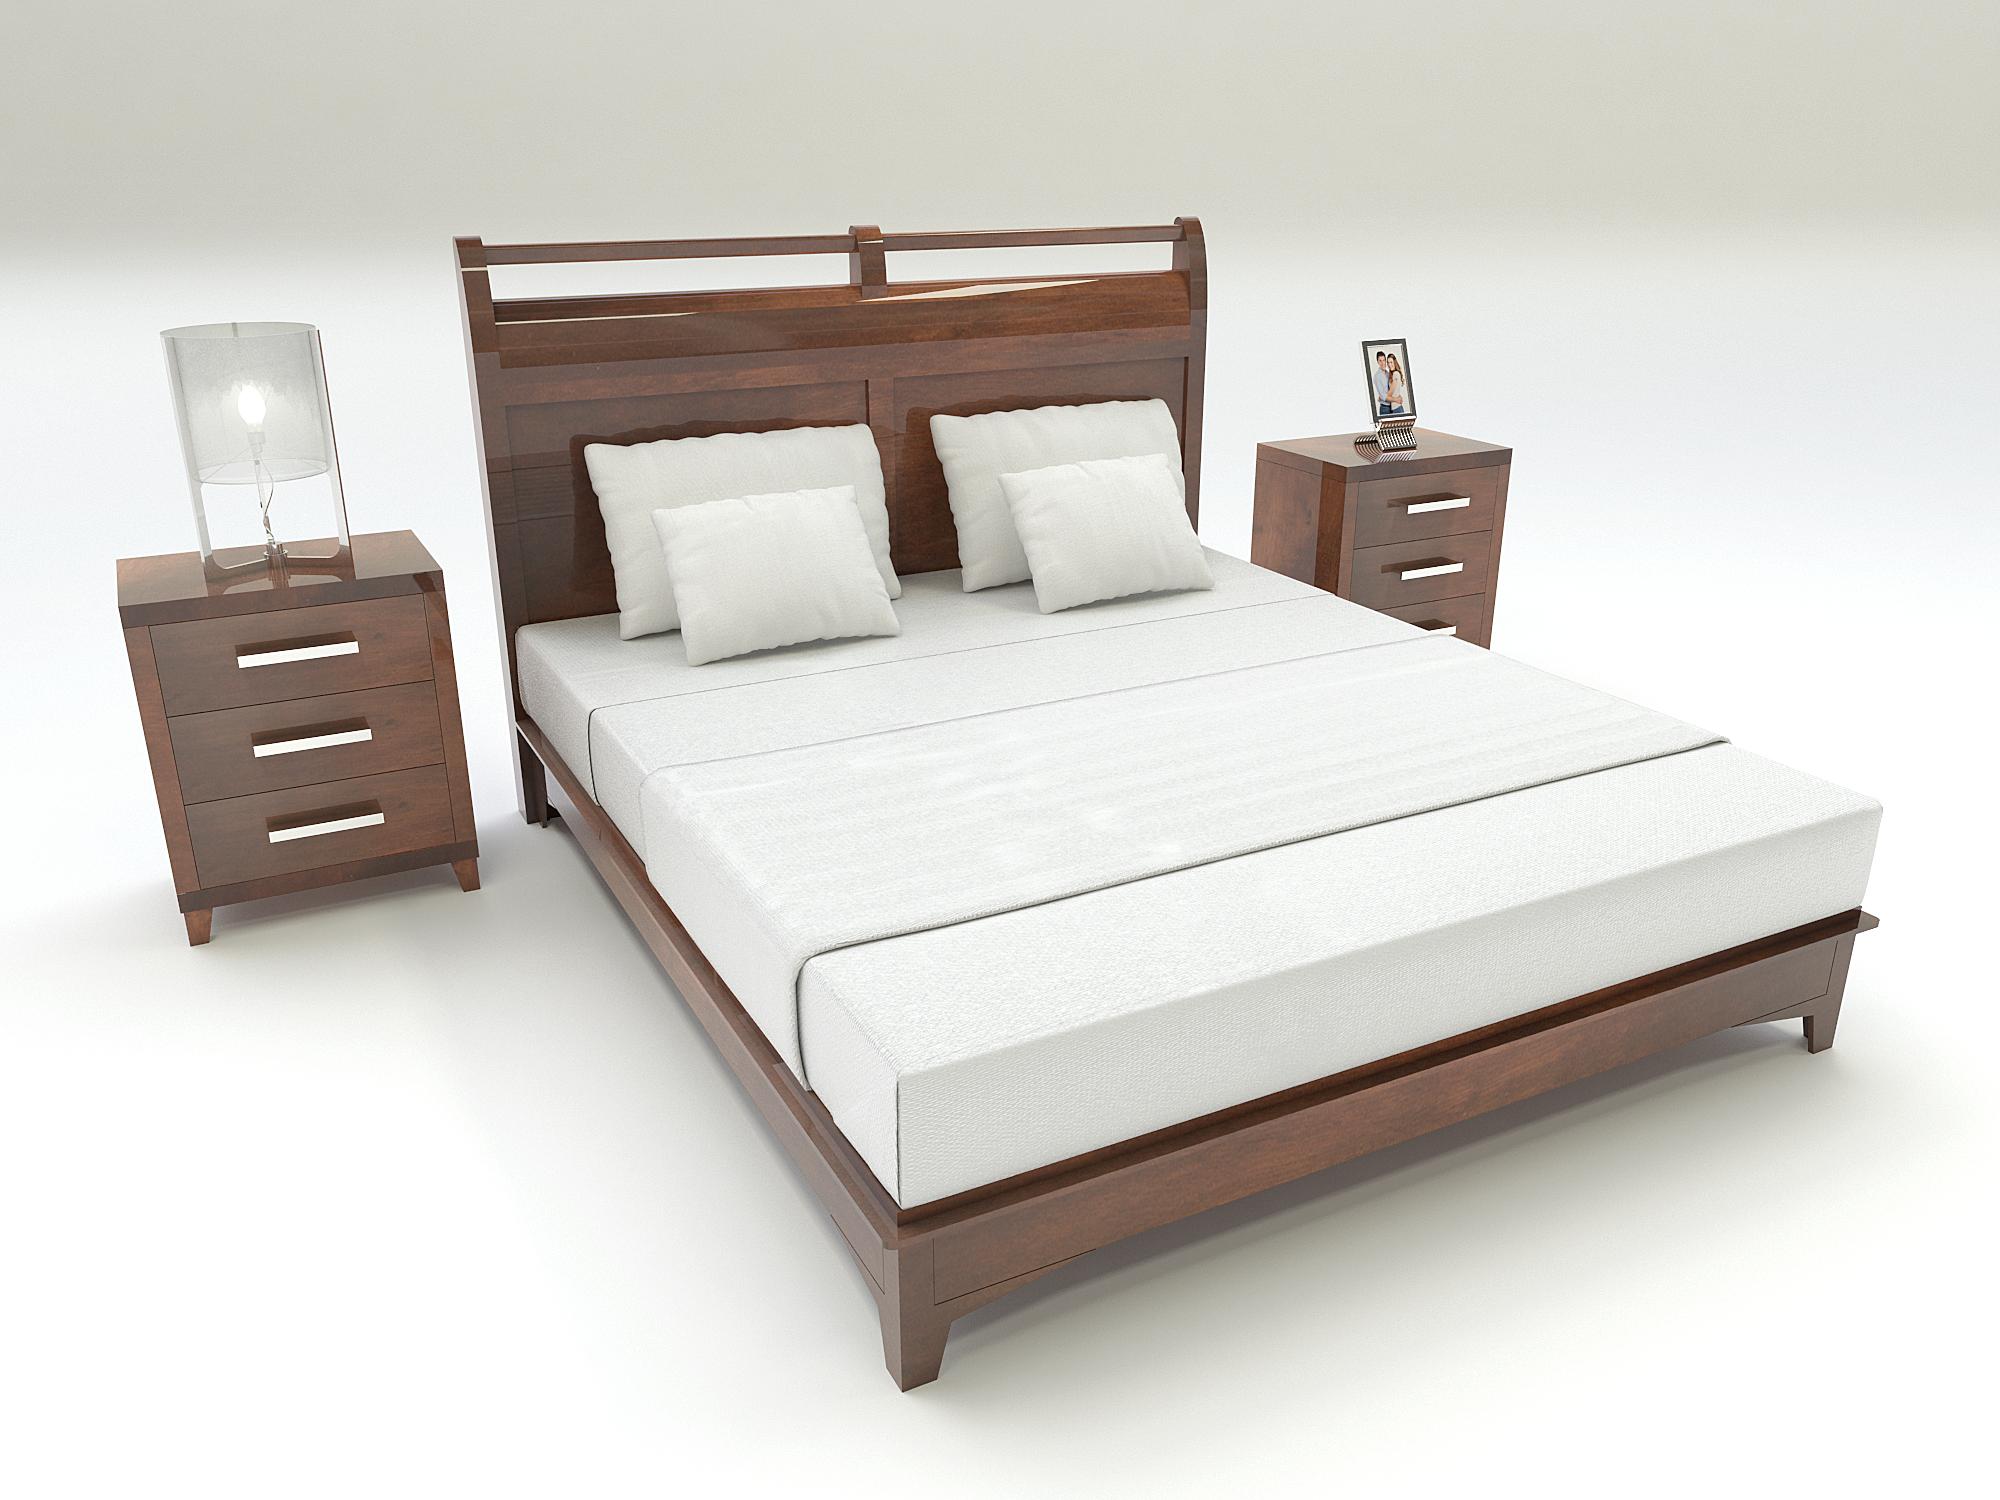 Cama Vanger Personalizable Tamano Colchon L140xl190 Bucaramanga Cama Madera Clasico Productocolombiano Furniture Home Decor Bed